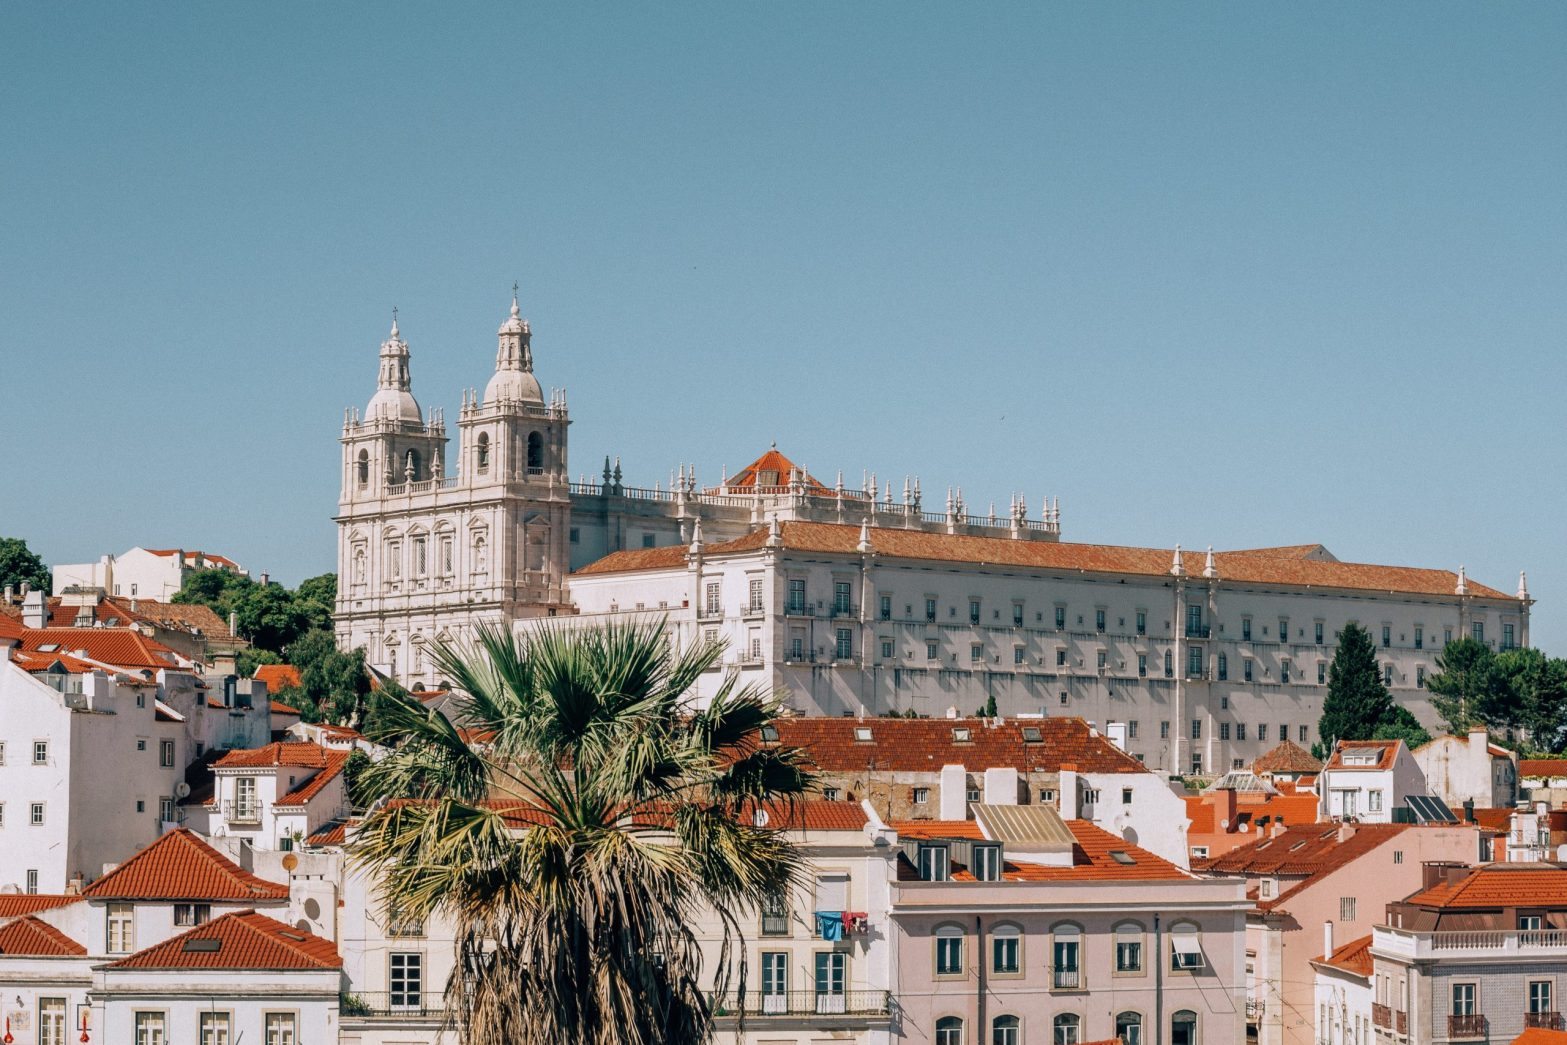 View of Alfama Neighborhood in Lisbon, Portugal